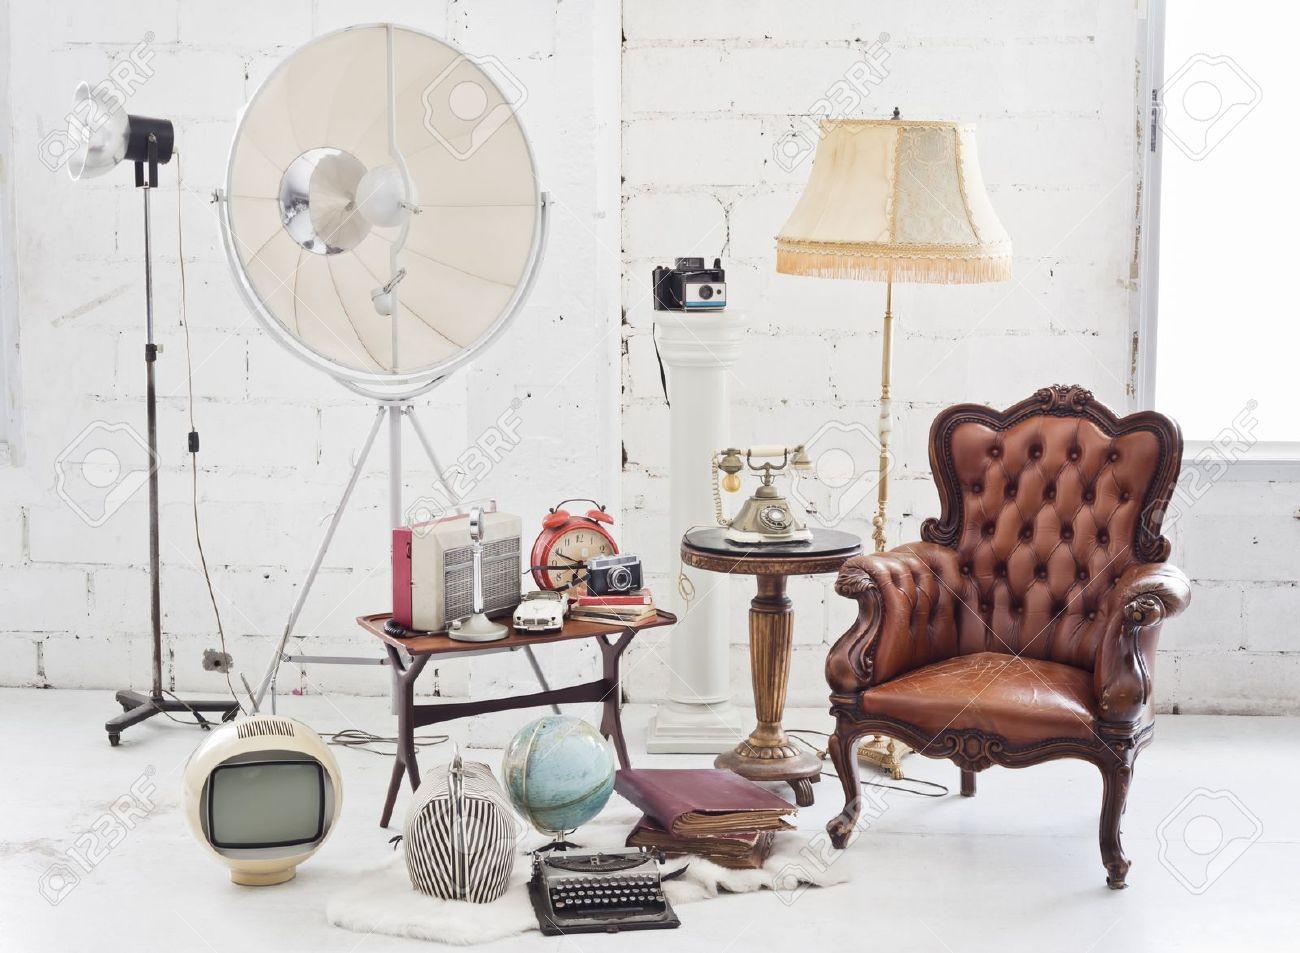 Retro Furniture And Decoration In White Room Stock Photo Picture